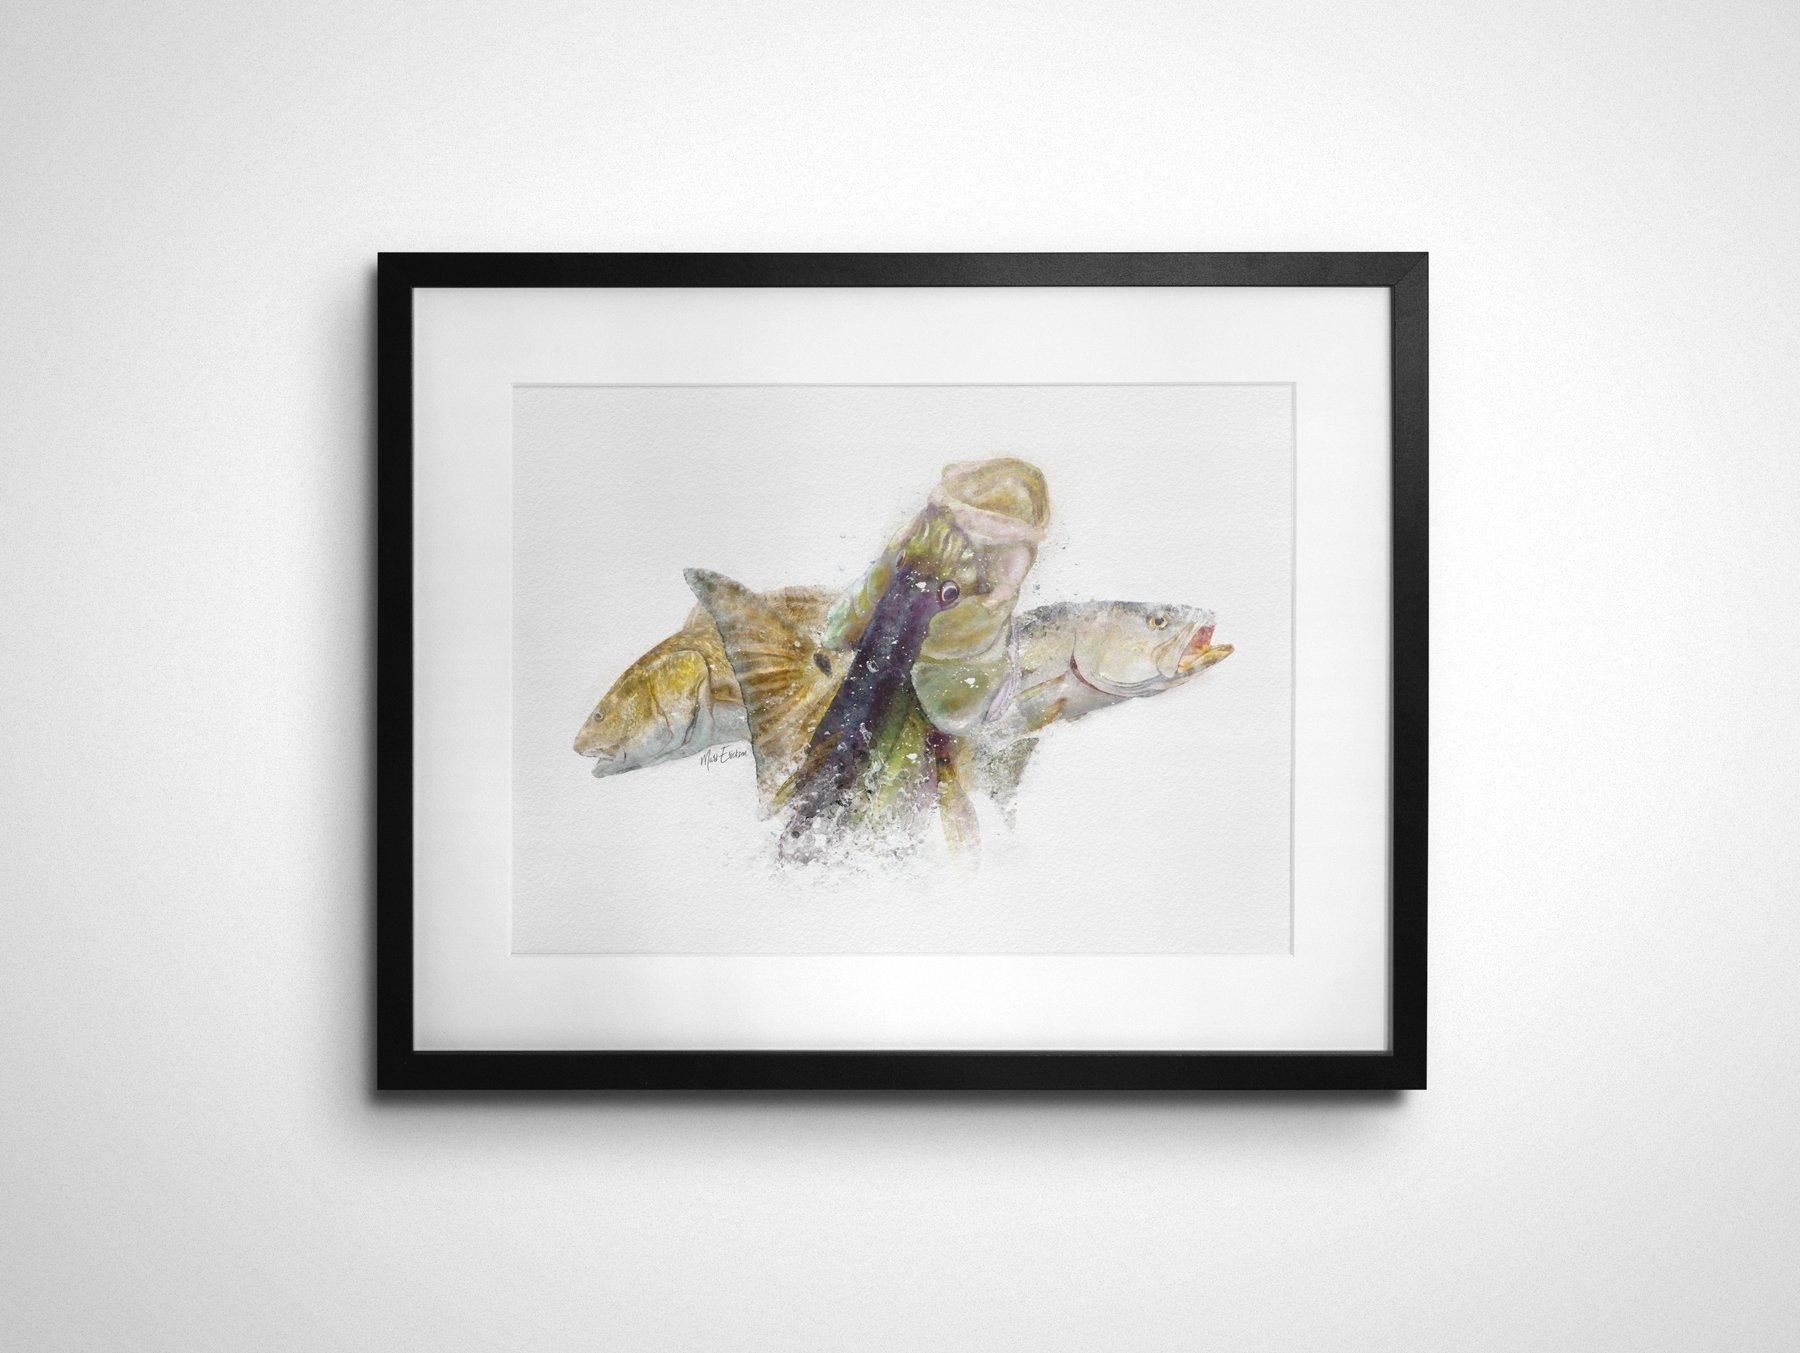 Inshore Slam florida art print of snook, redfish and trout